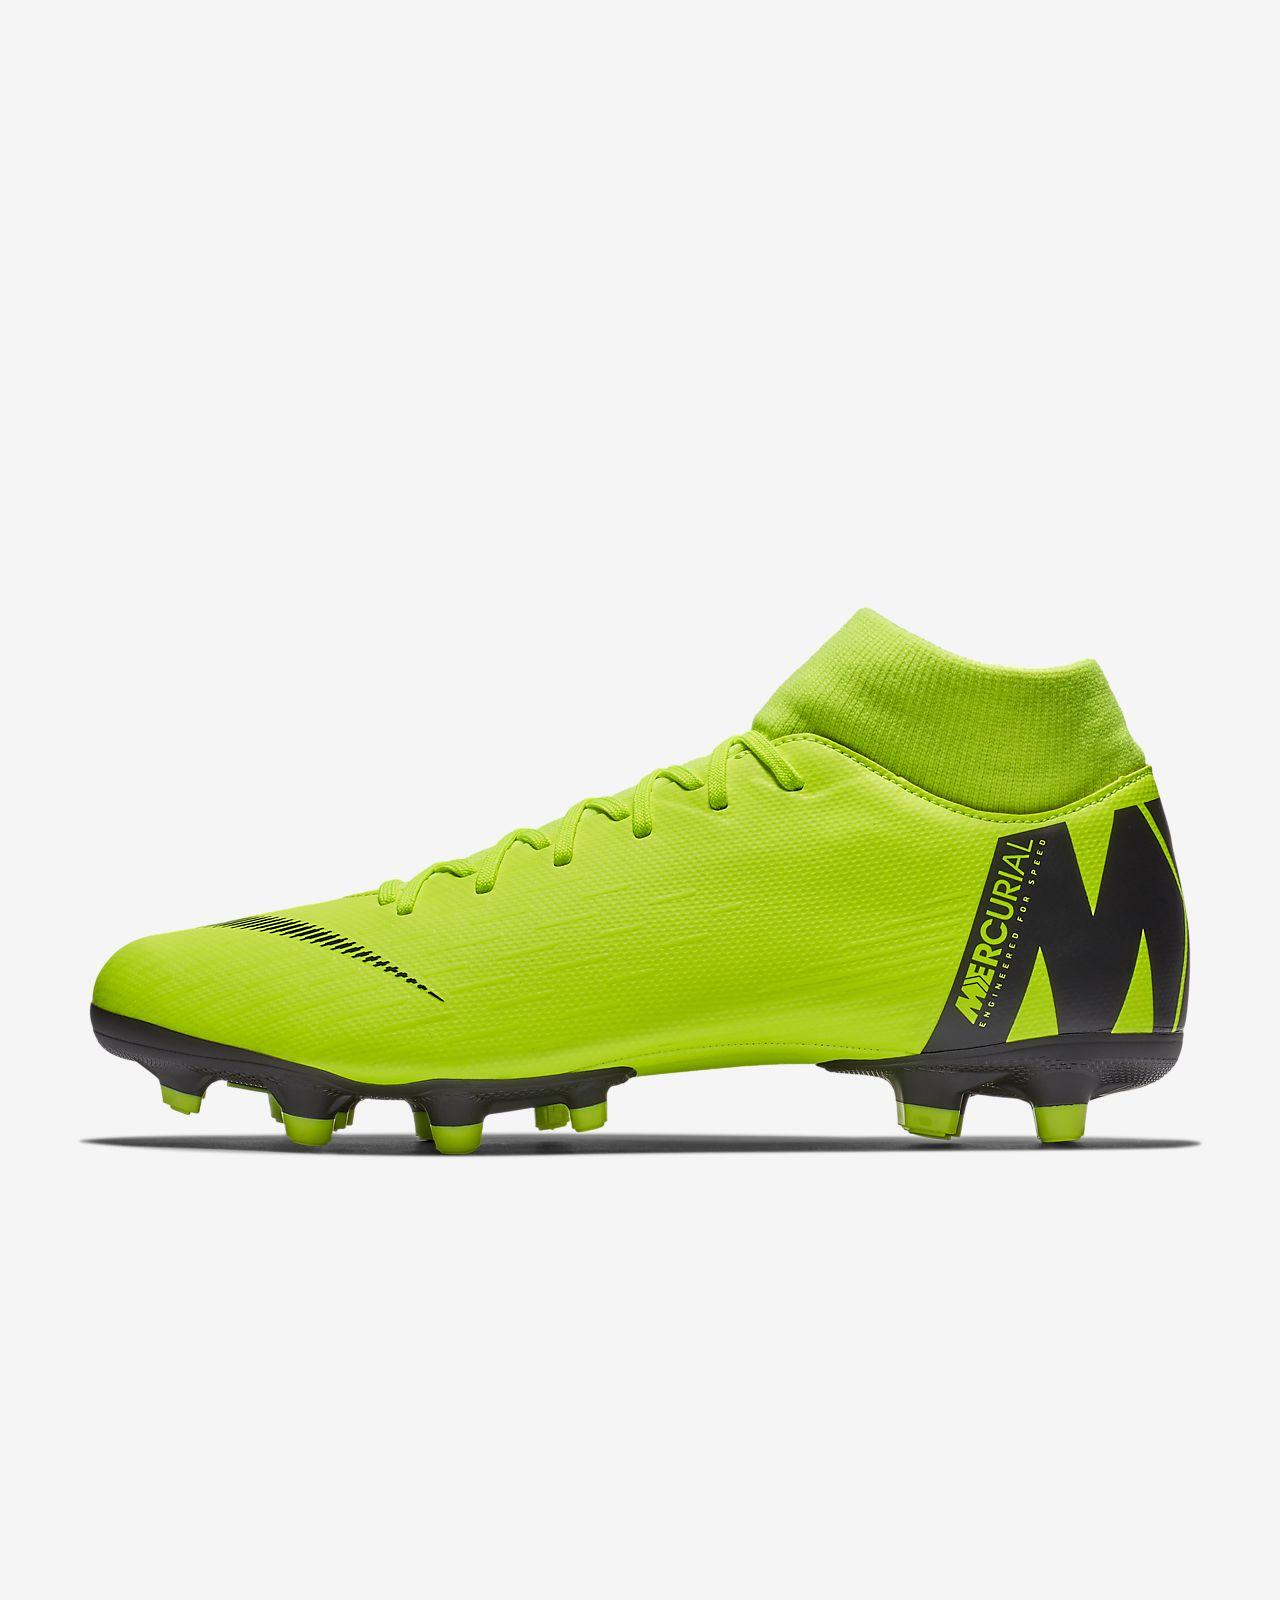 ... Nike Mercurial Superfly 6 Academy MG Botas de fútbol para múltiples  superficies 4cfbc84f9c8b6